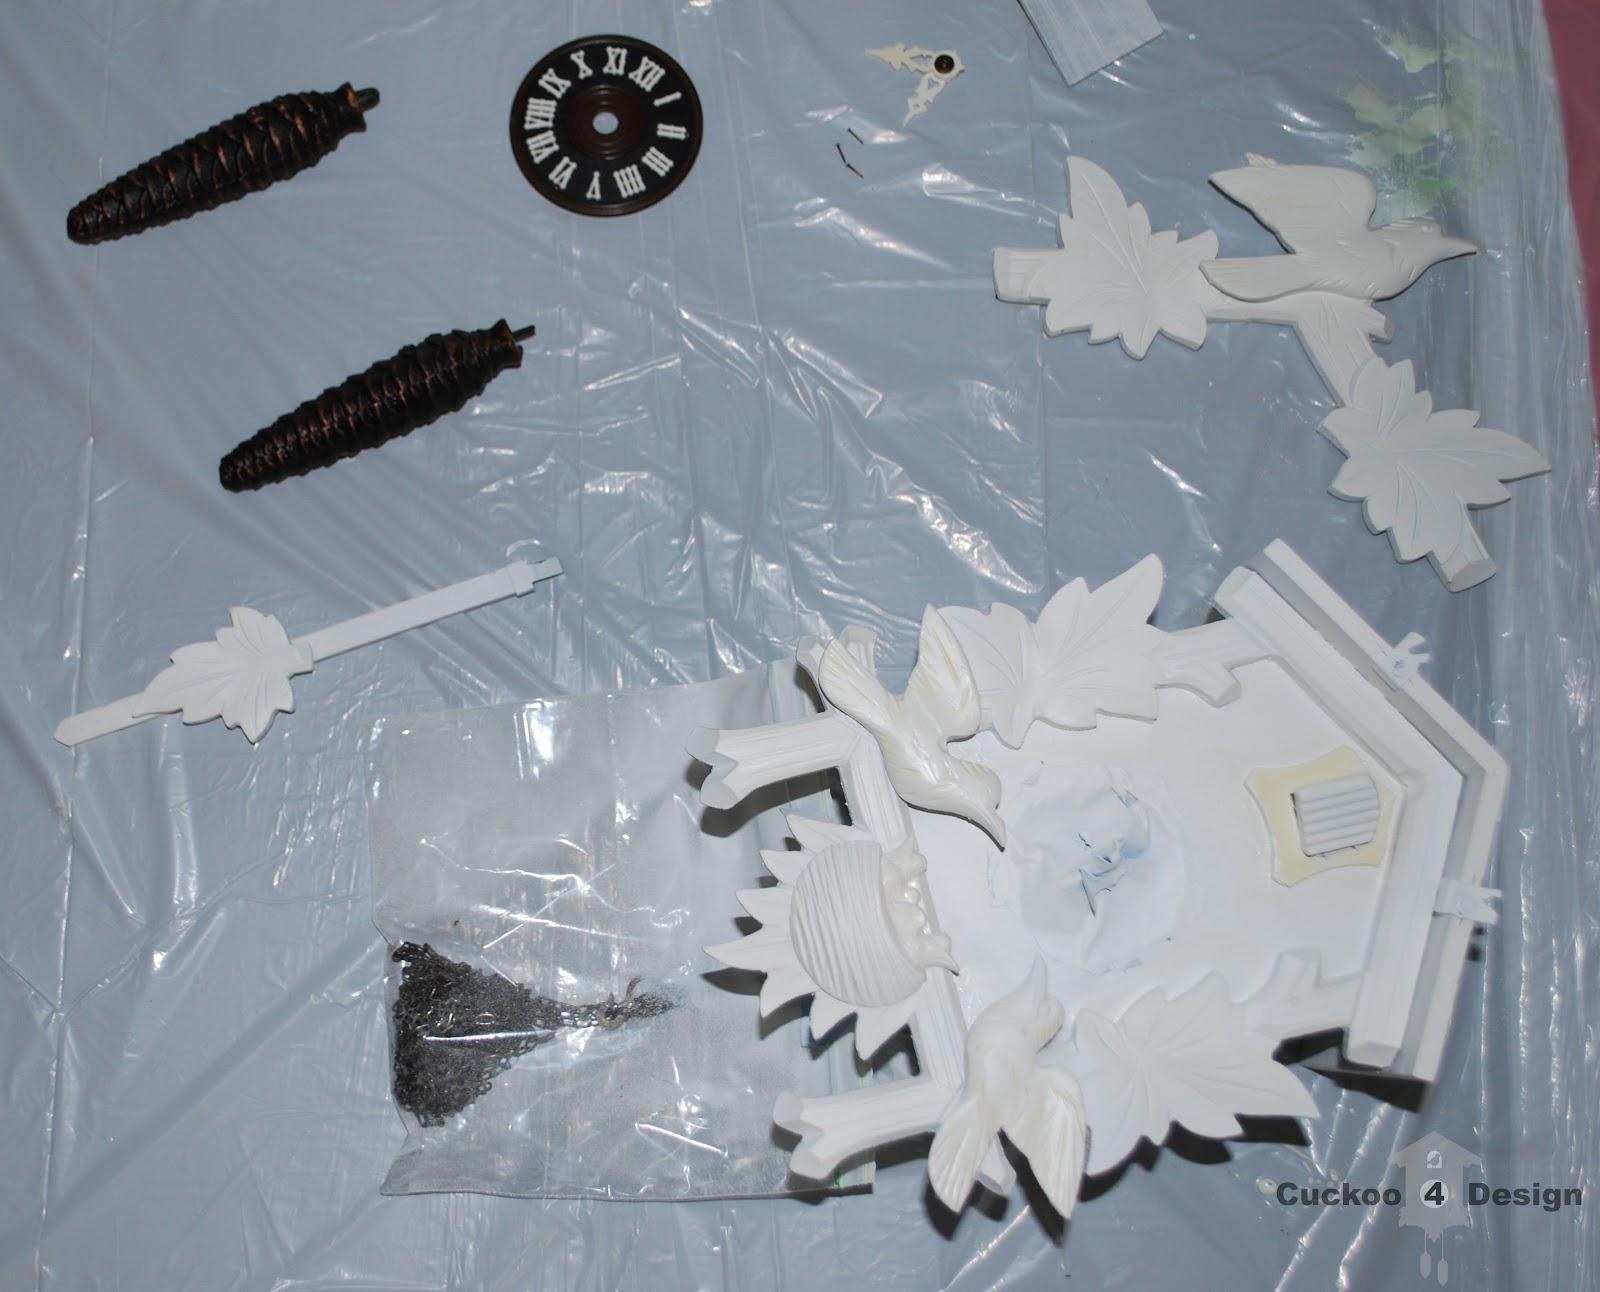 painted cuckoo clocks | Cuckoo4Design